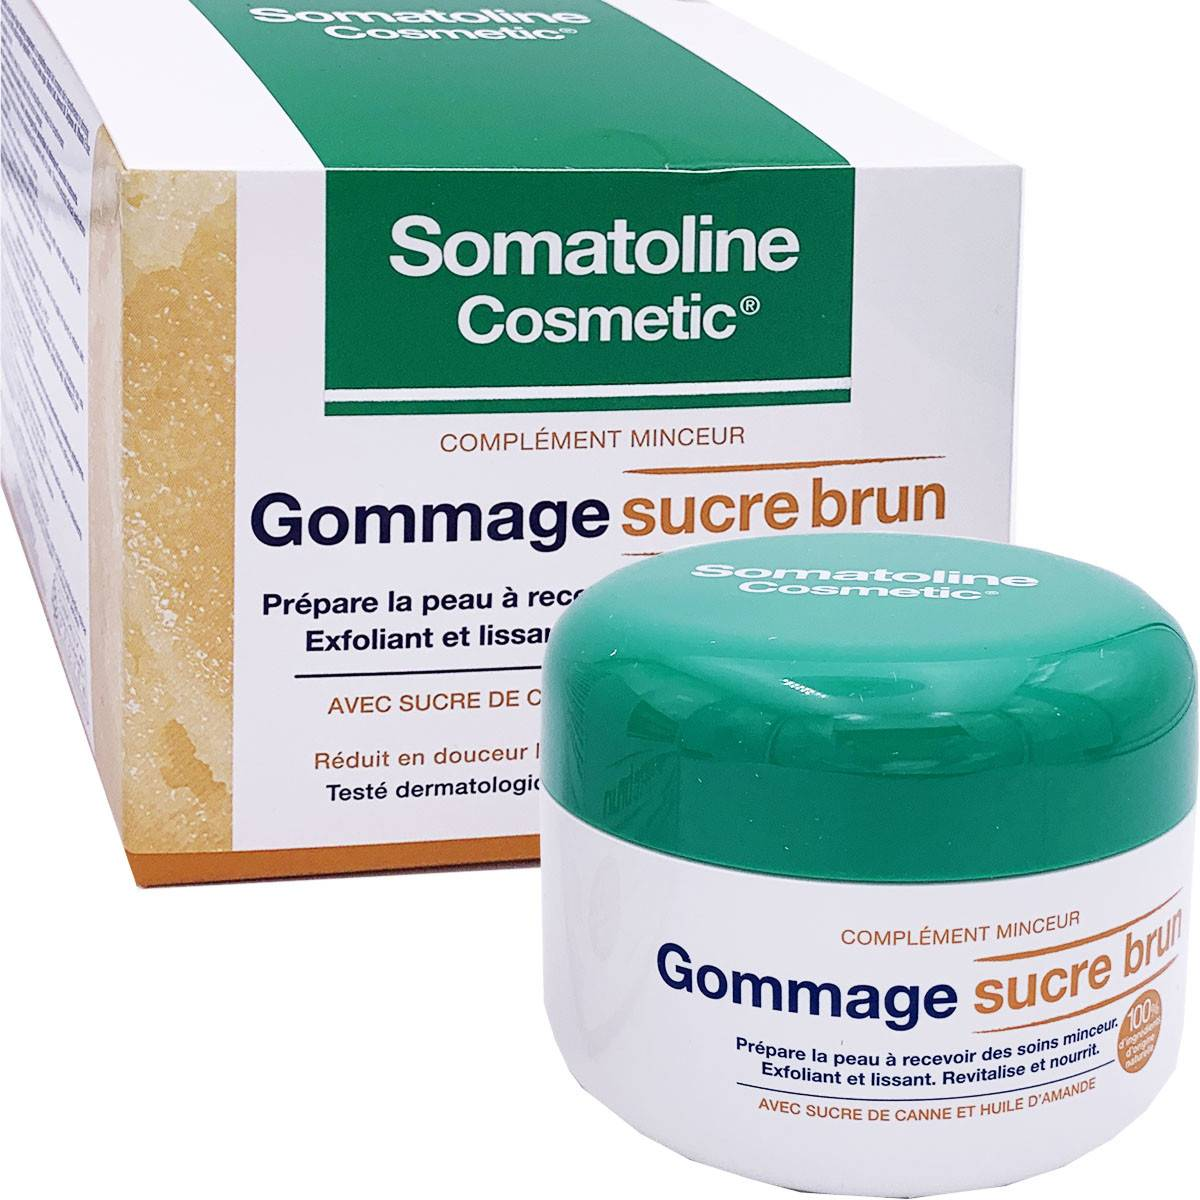 Somatoline gommage sucre brun 350g